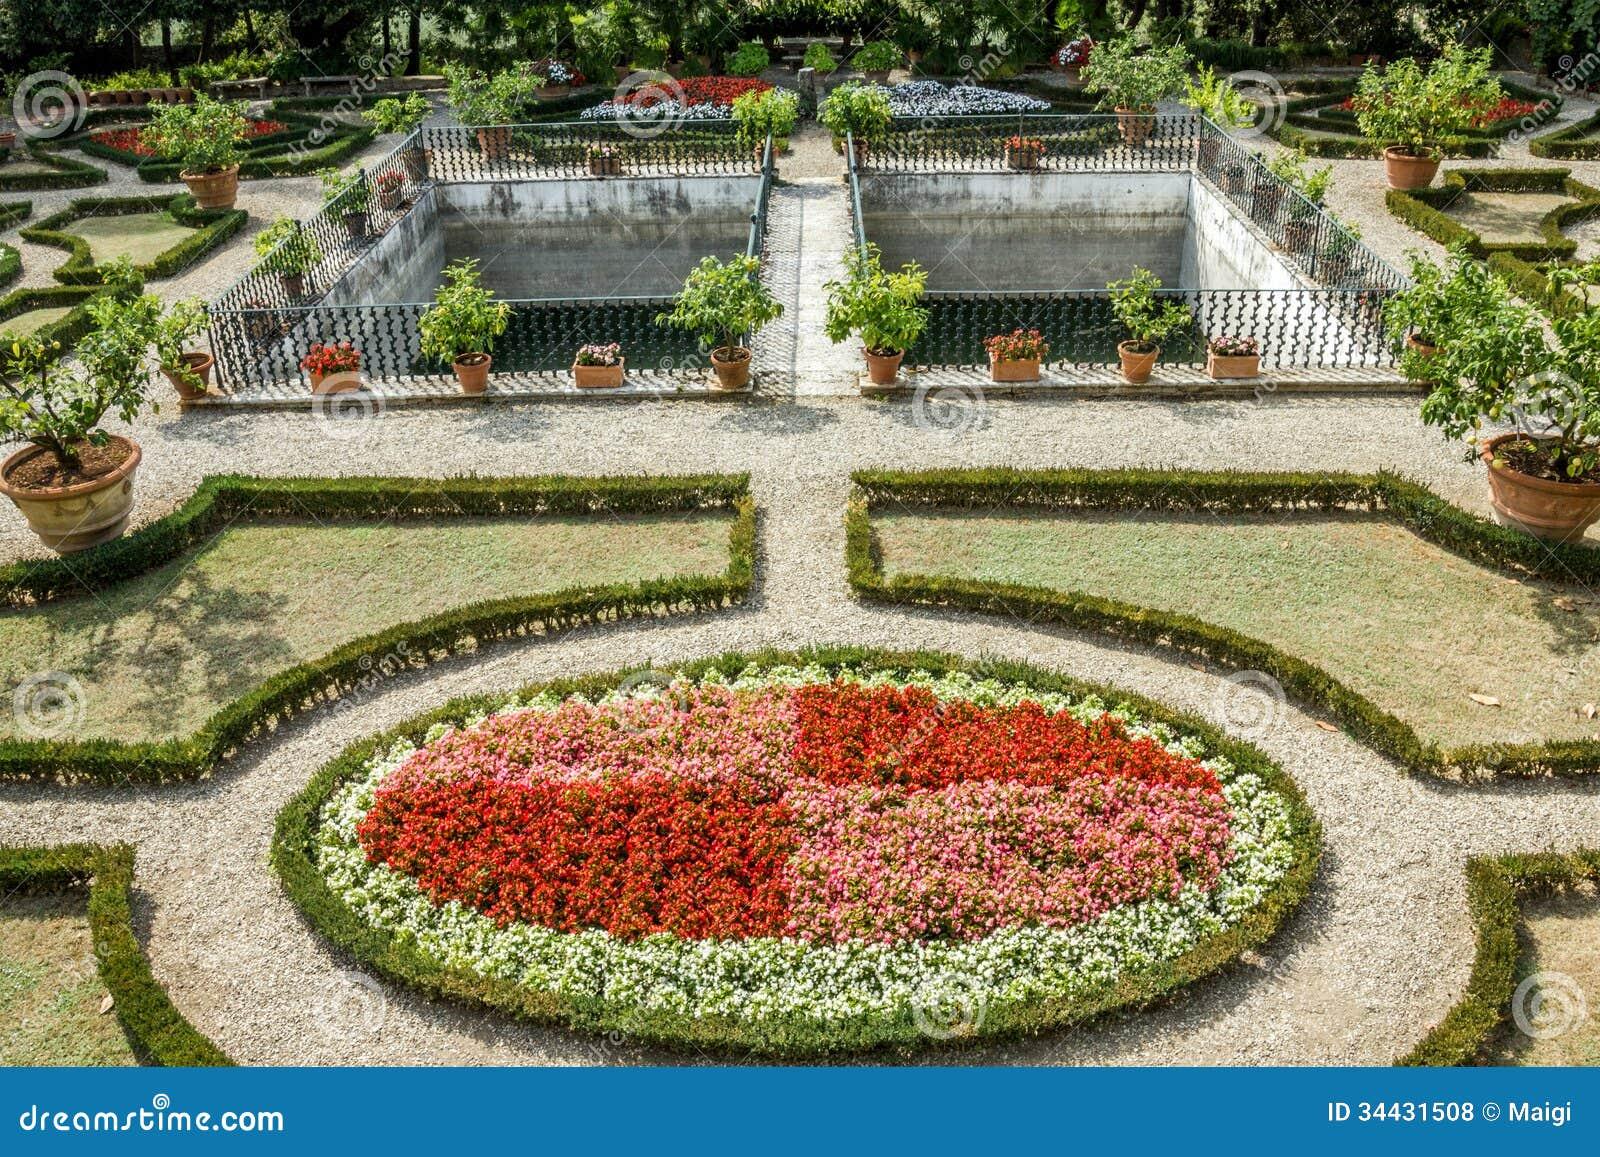 Download Garden stock photo. Image of grass, design, park, floral - 34431508